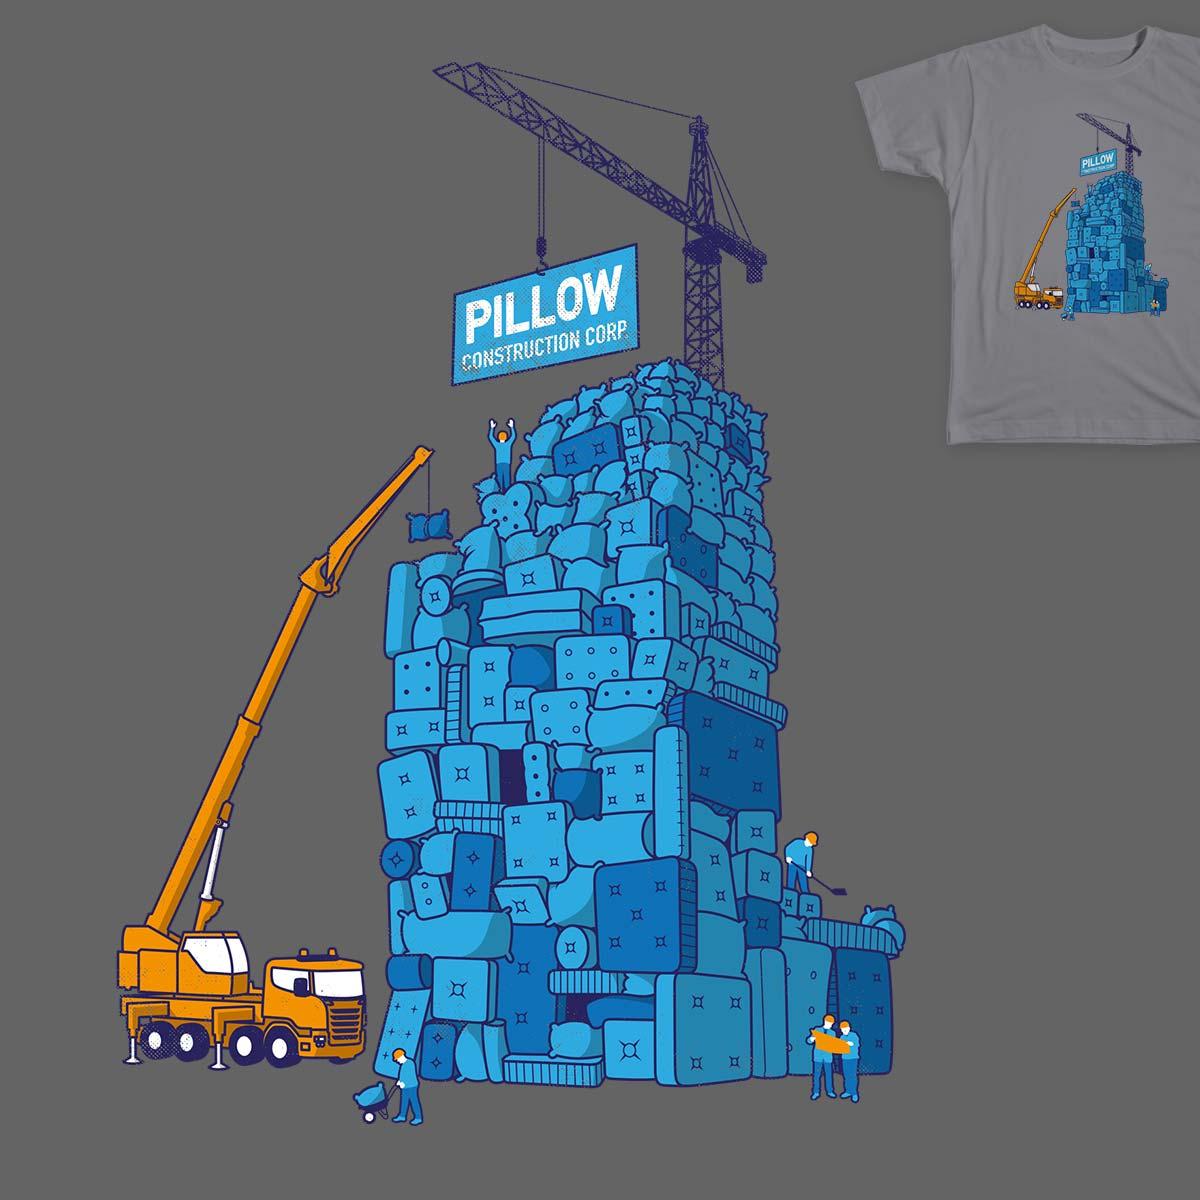 Pillow Construction Corp. by damusp on Threadless